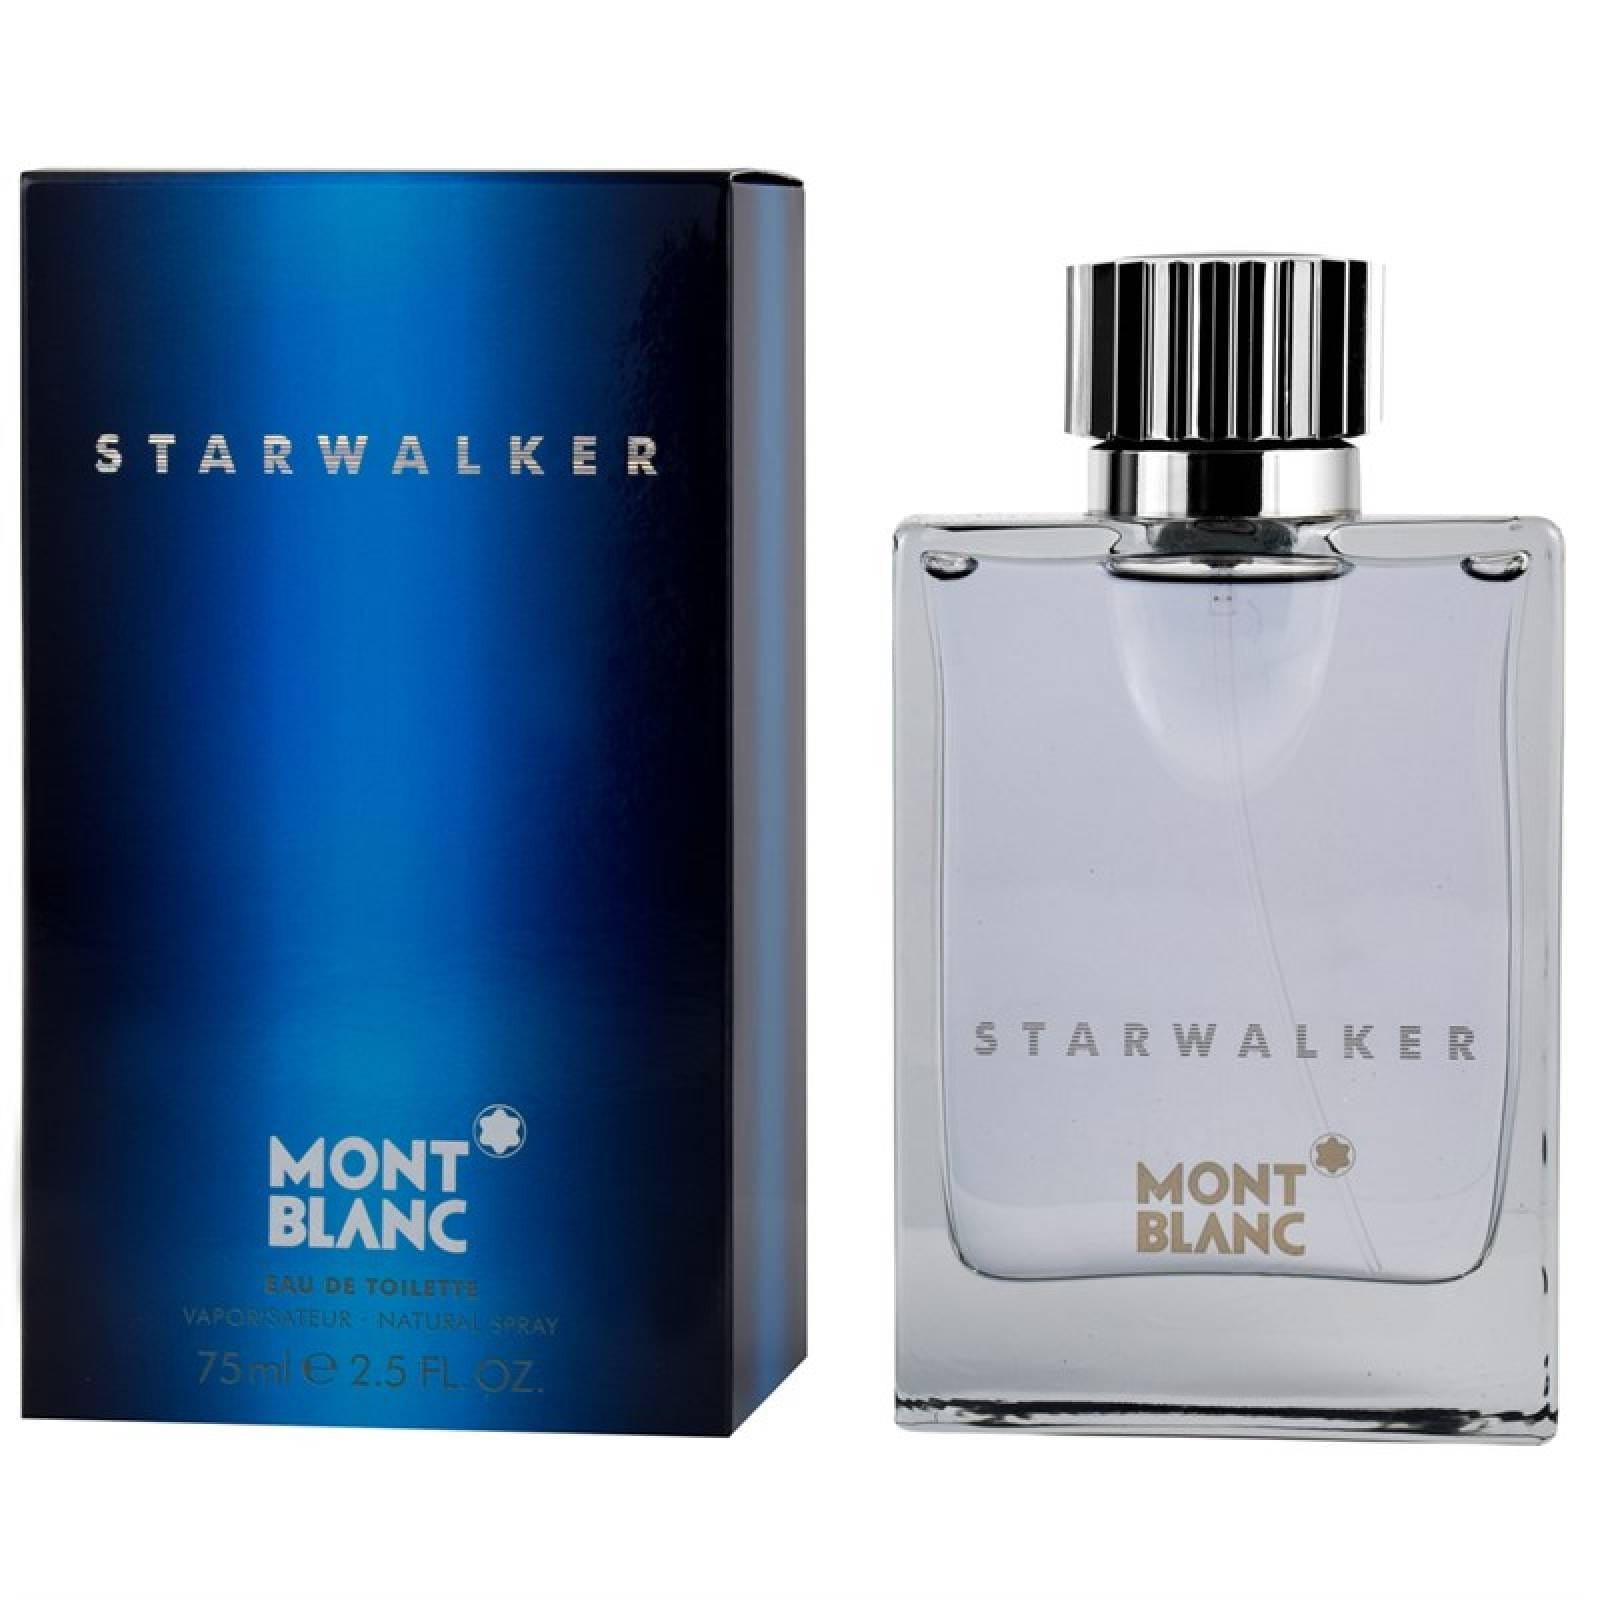 Starwalker de Mont Blanc Eau de Toilette 75 ml Fragancia para Caballero